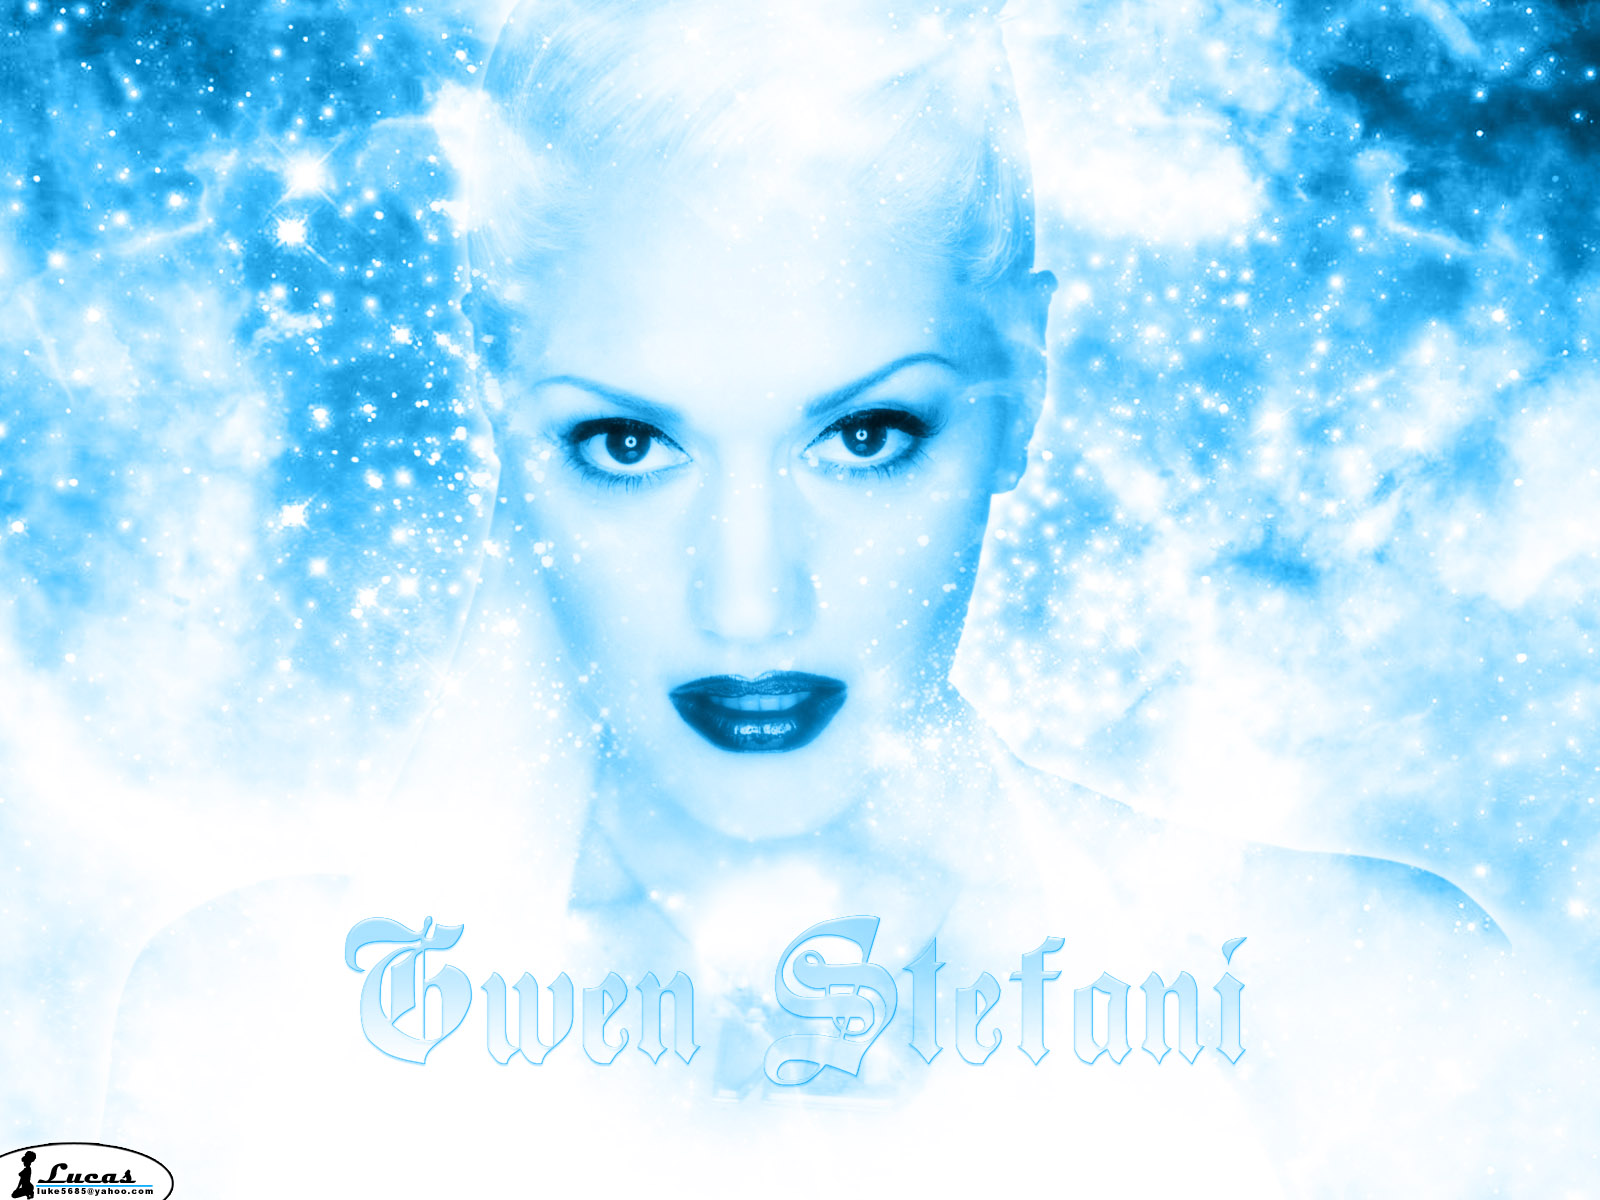 http://4.bp.blogspot.com/--6yaQmkG67U/T5qqD9D5DTI/AAAAAAAAARk/J_NJV83HhHE/s1600/Gwen+Stefani+Wallpapers+6.jpg